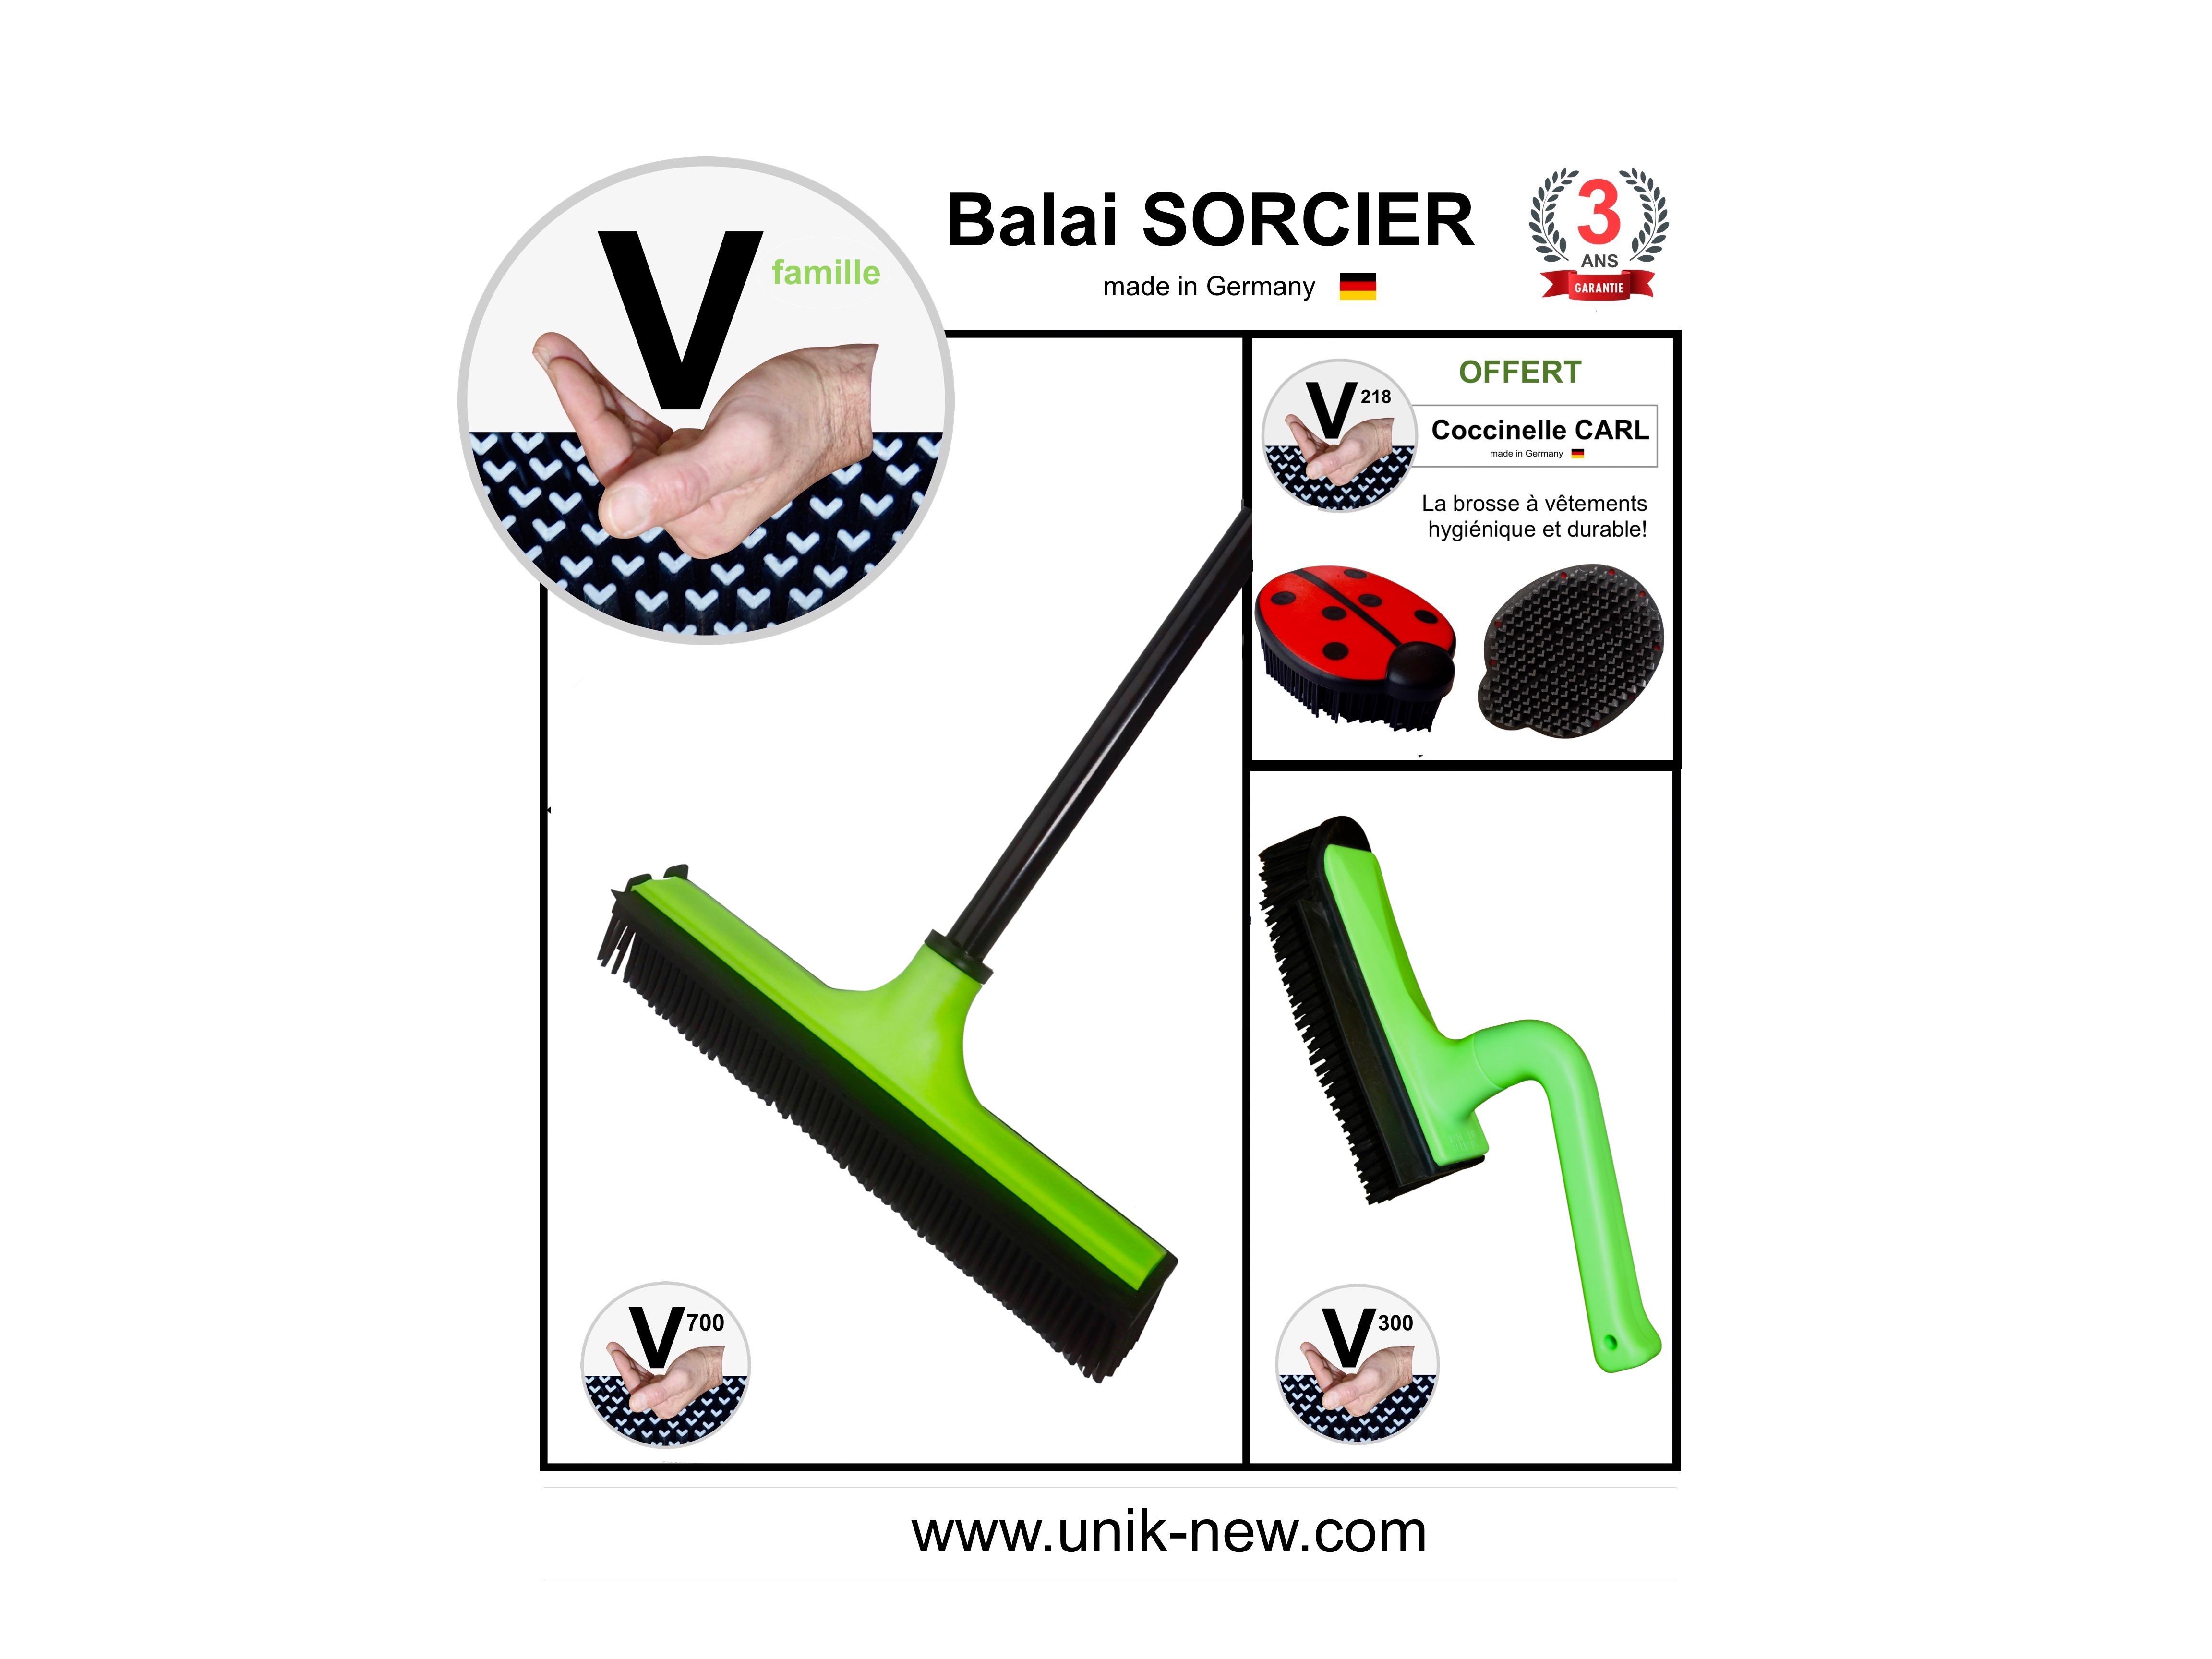 Kit promo Balai SORCIER V700 picots famille vert Mojito . UNIK NEW sasu